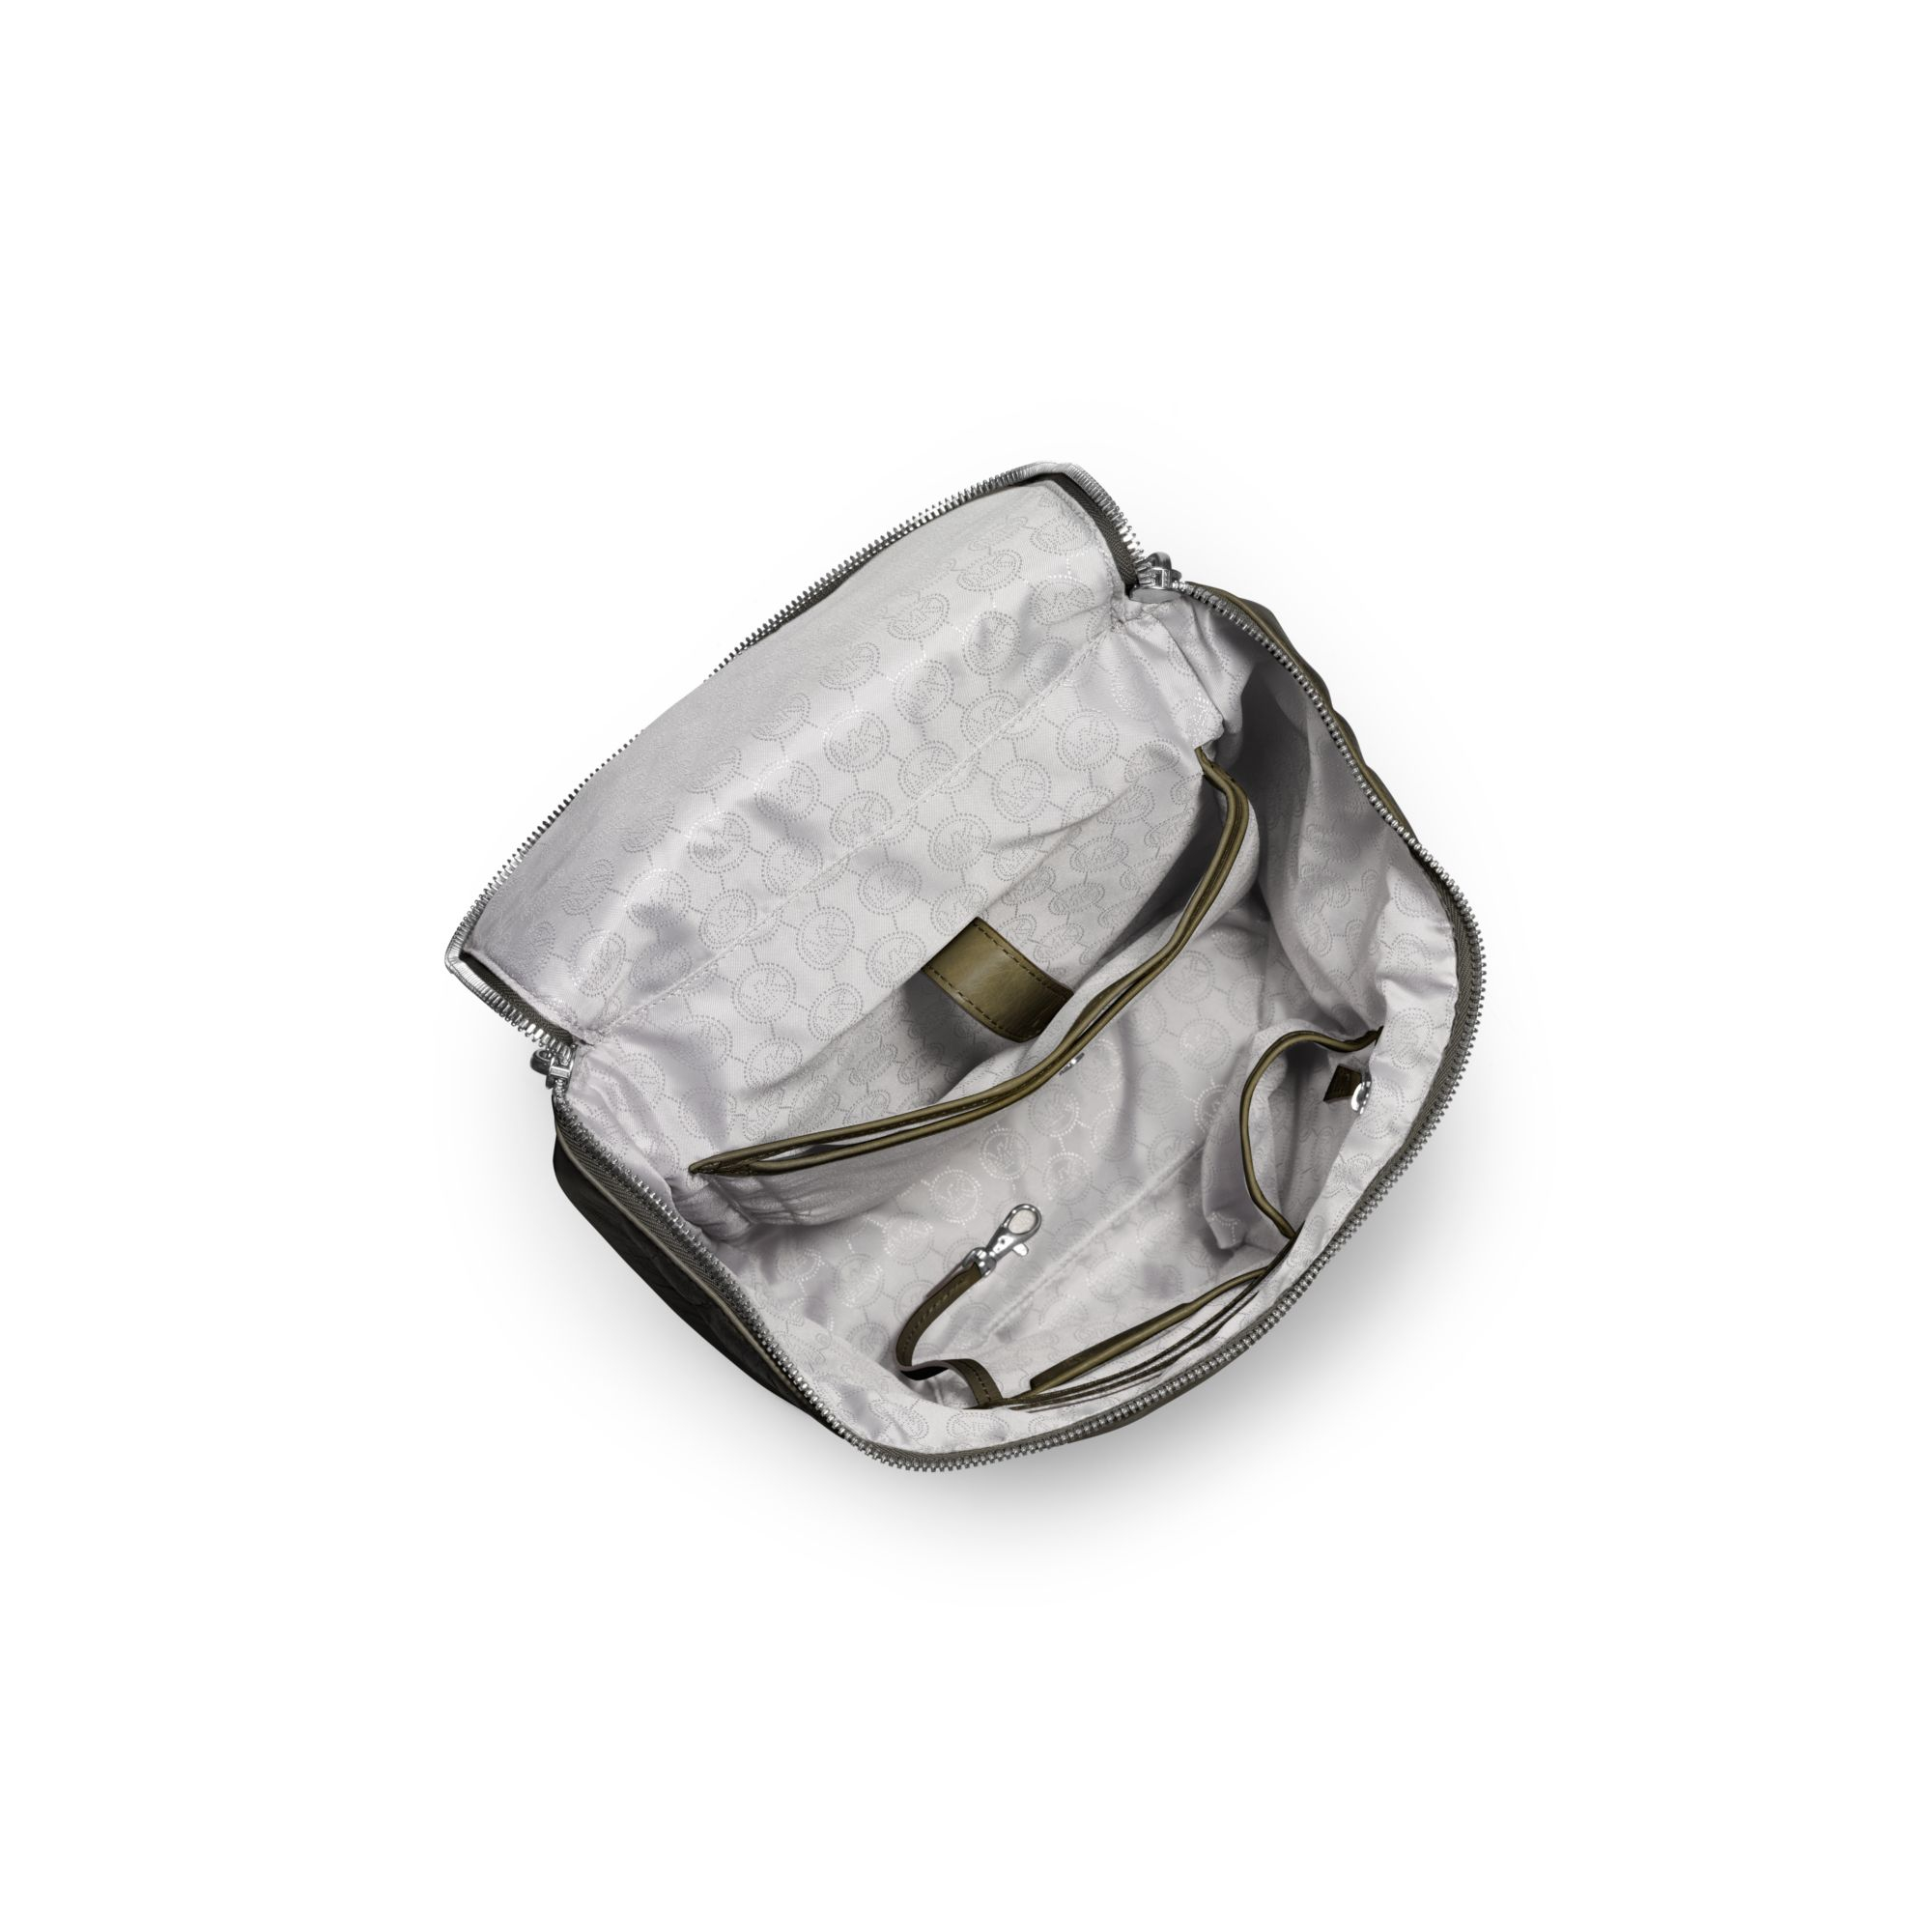 b54f29f95cdb ... get lyst michael kors lisbeth leather medium backpack in green 2e1fa  65870 ...